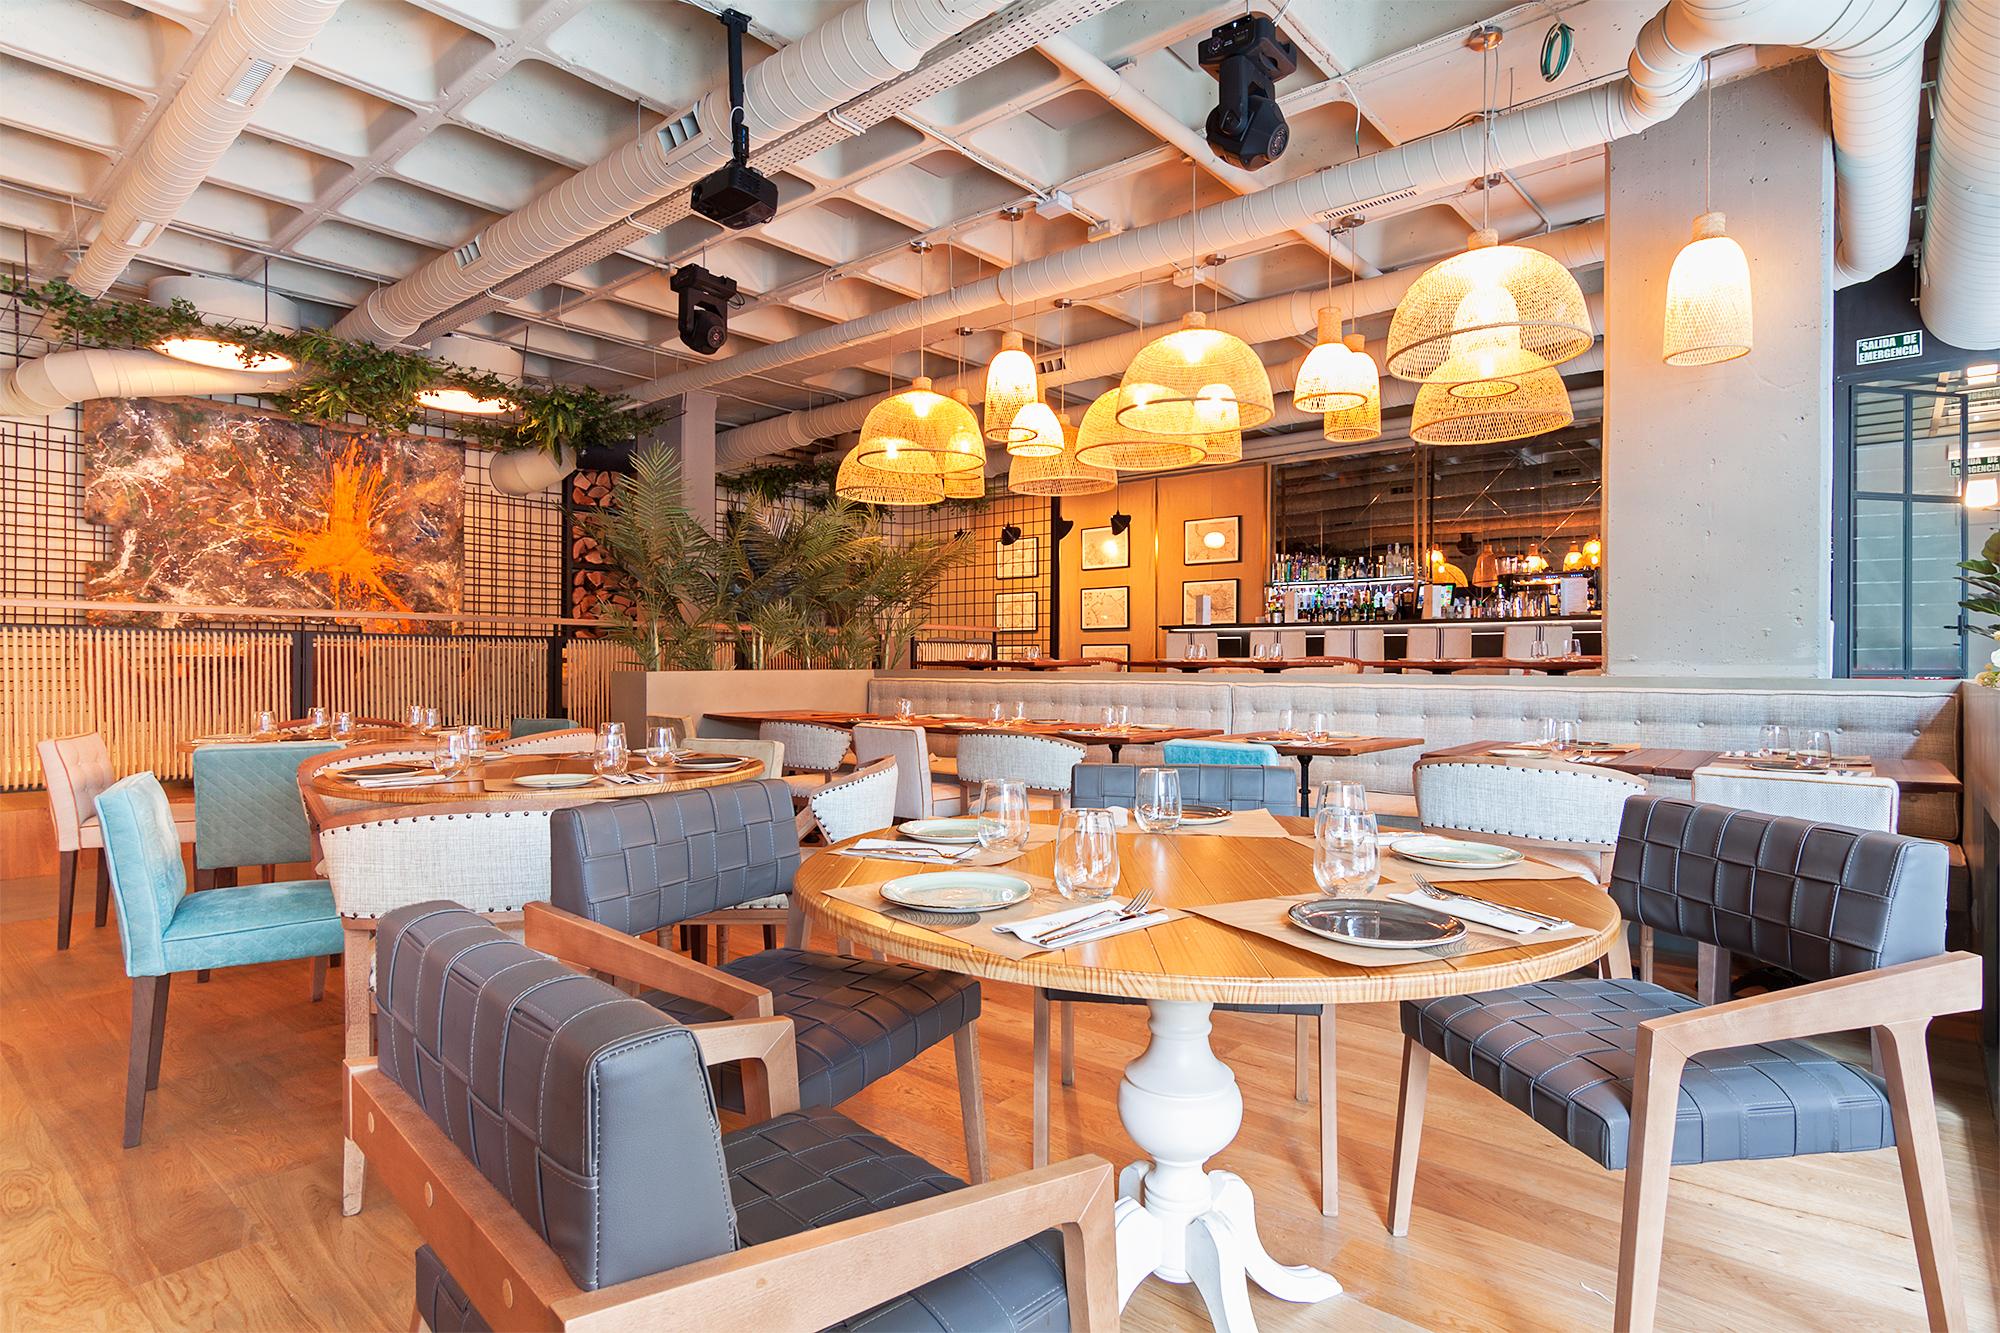 Restaurante Marieta Infortursa Revista De Viajes Patrimonio  # Muebles Marieta